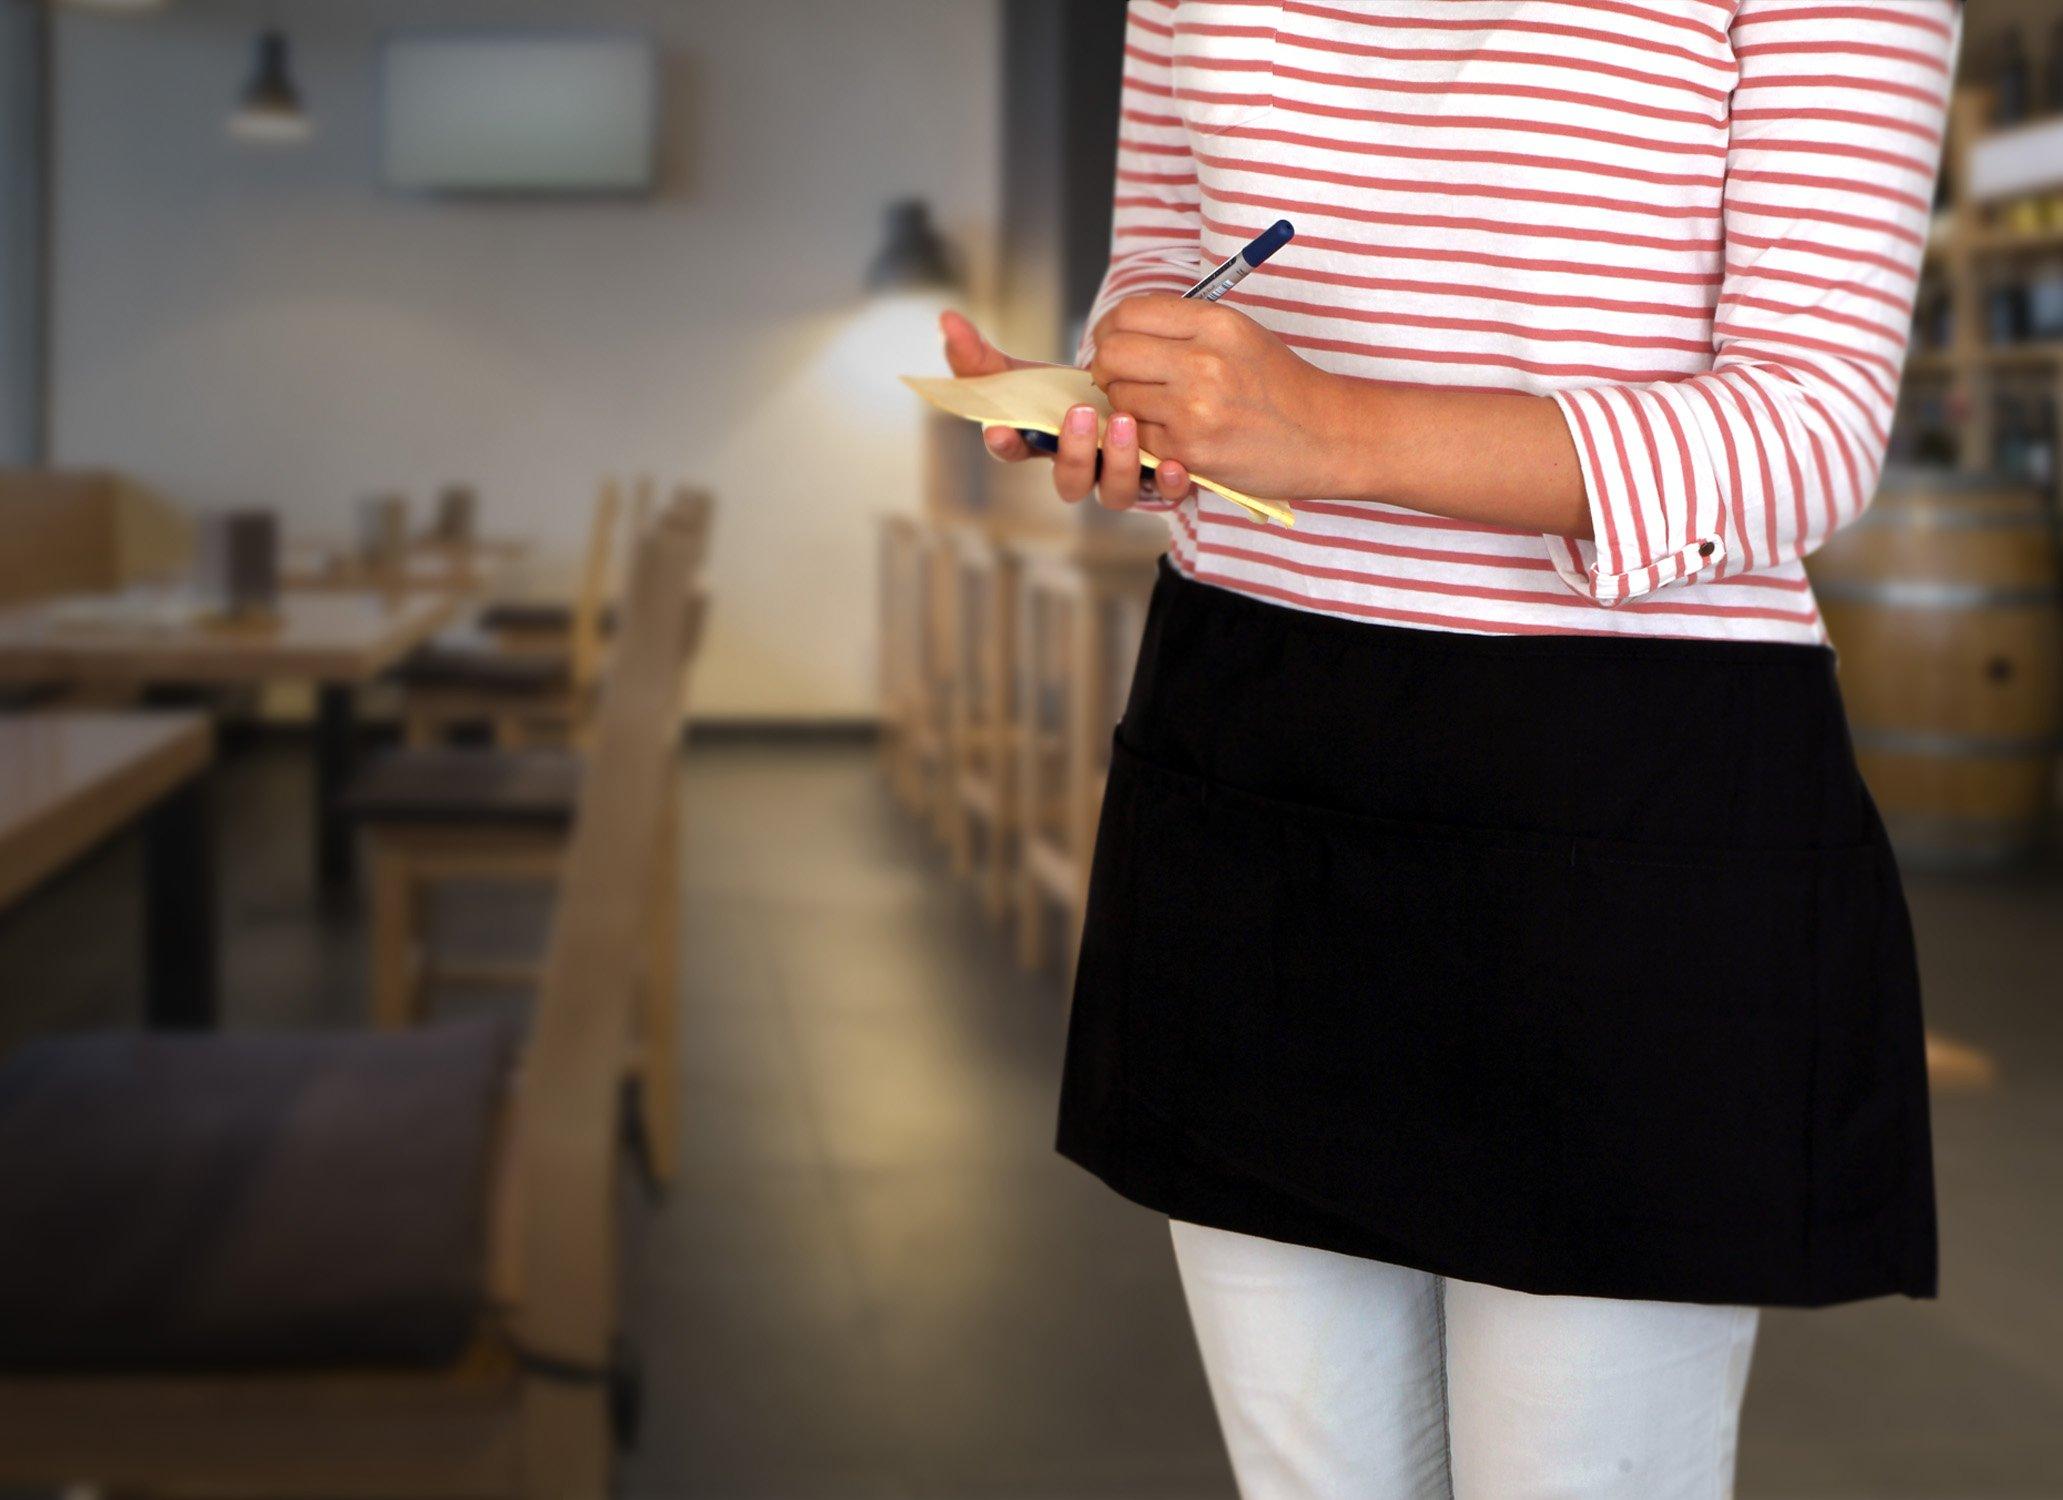 Utopia Kitchen 3 Pockets Waist Apron (Set of 12, Black, 24 x 12 inches) - Restaurant Half Aprons, Bartender Apron, Money Apron, Check Holder by Utopia Kitchen (Image #8)